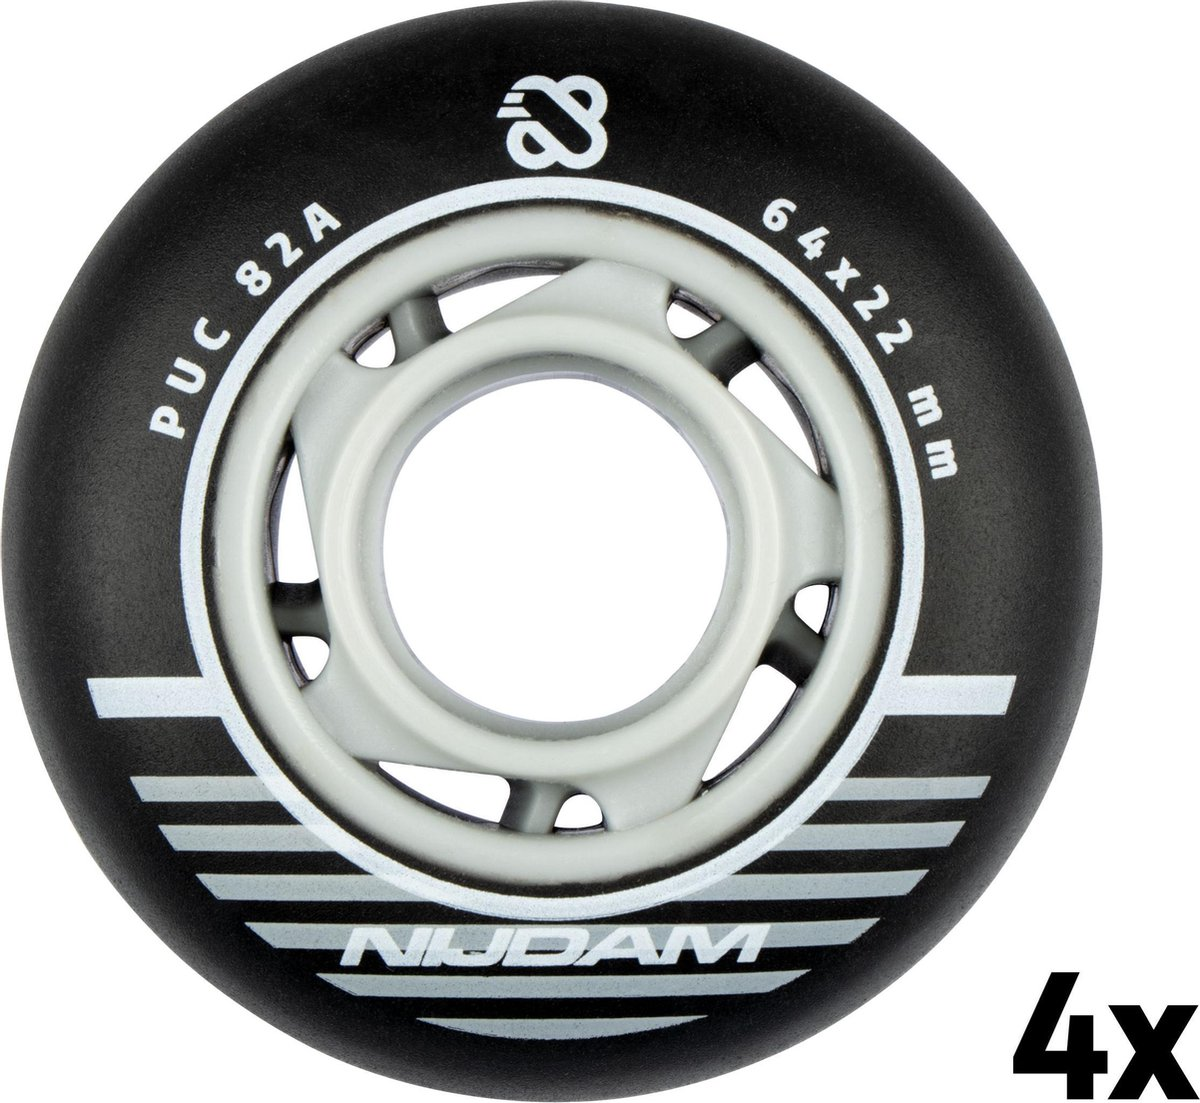 Nijdam Inline Skate Wielen Set - 64x22 mm - 4st - Black - Zwart/Zilver/Wit